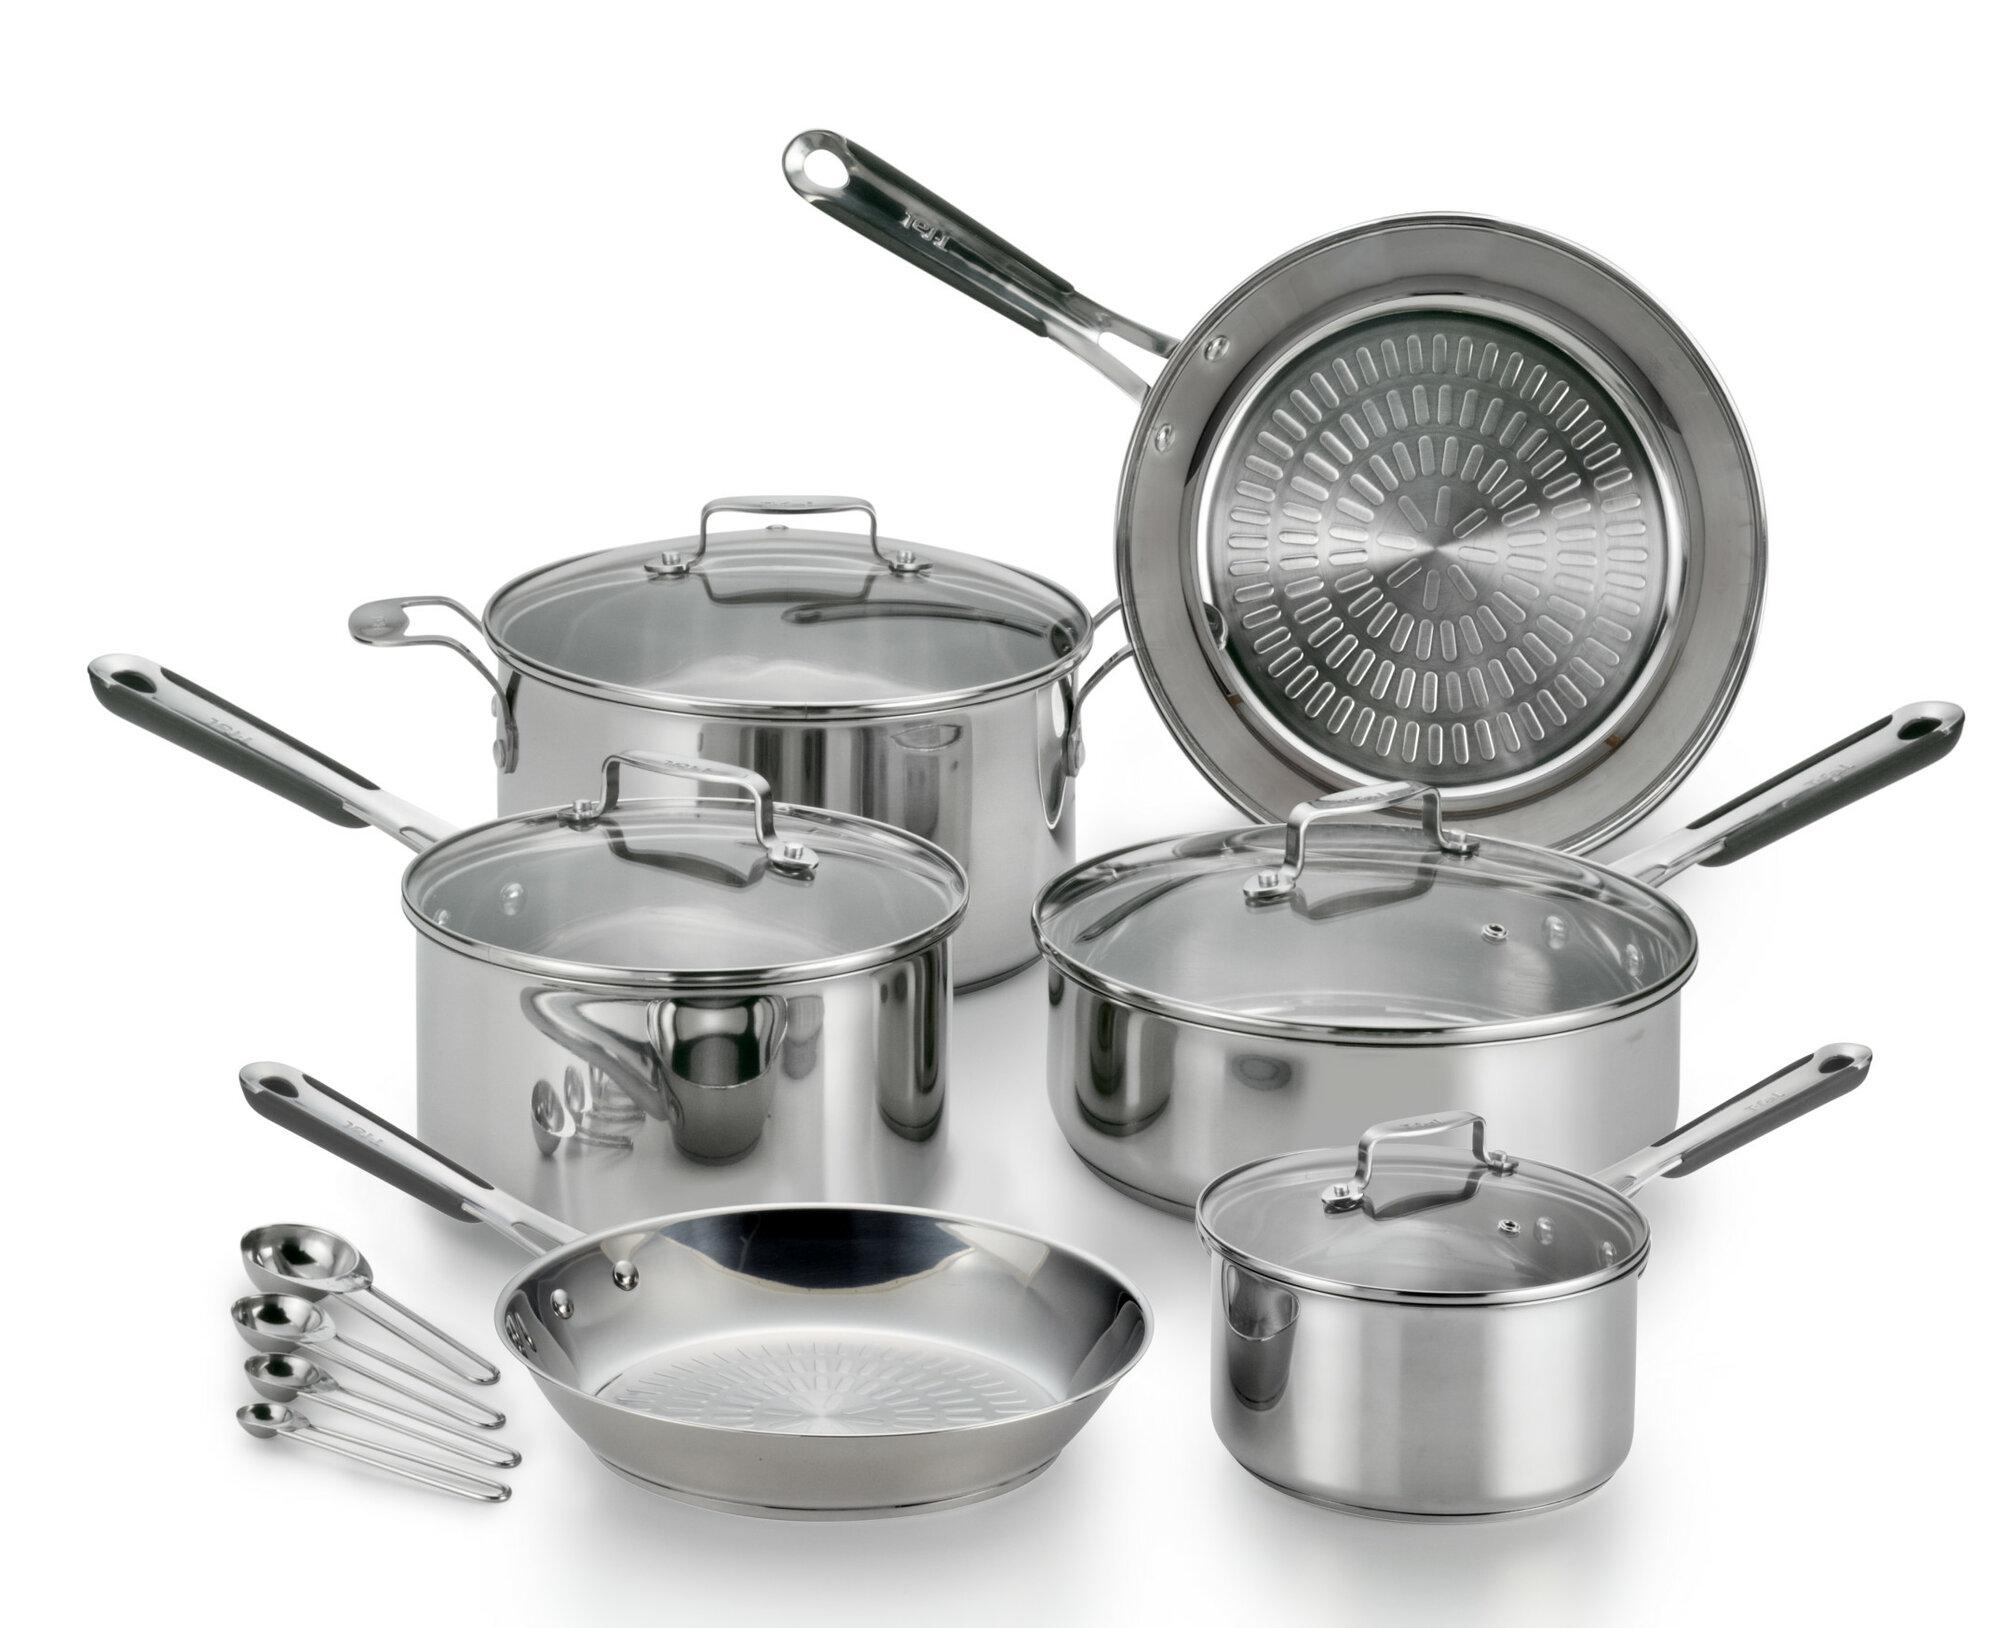 t fal performapro 14 piece stainless steel cookware set ebay. Black Bedroom Furniture Sets. Home Design Ideas